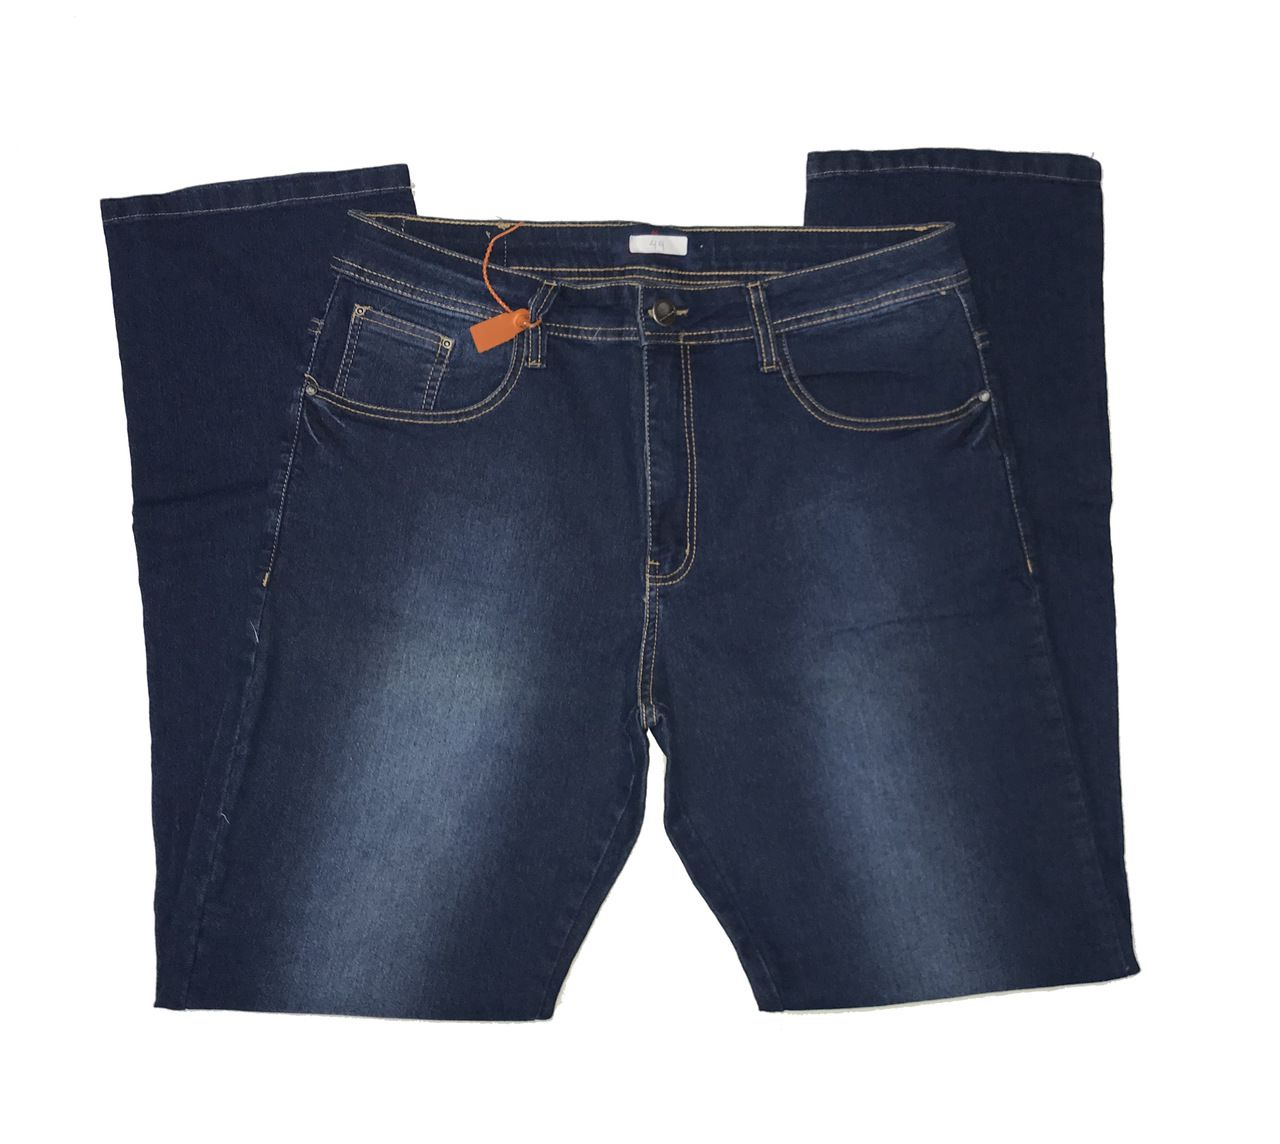 Calça Jeans Masculina   - Boutique Mangalarga